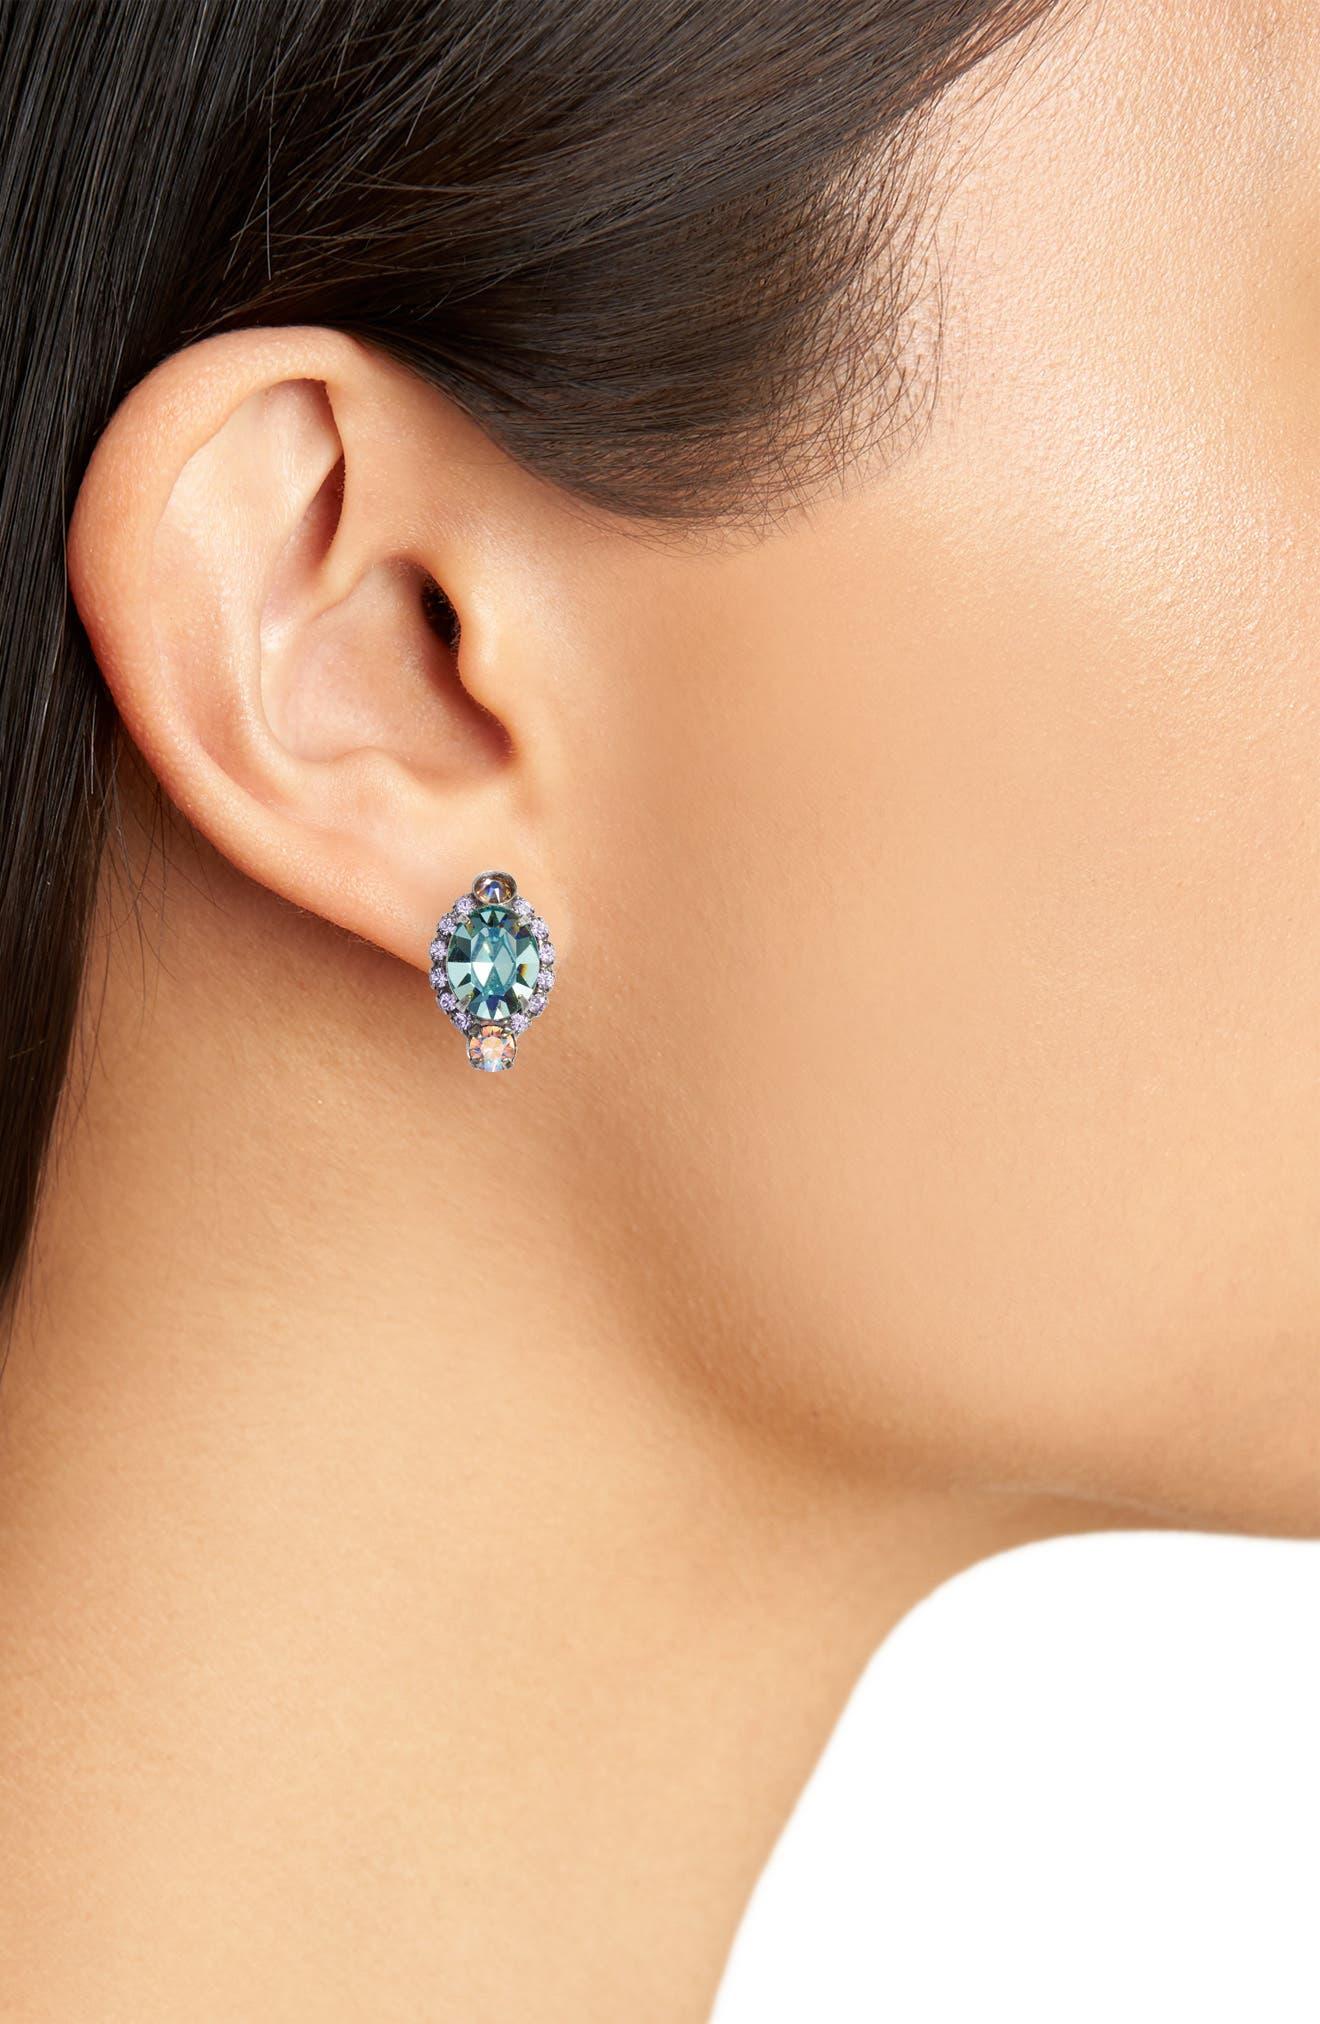 Adenium Crystal Earrings,                             Alternate thumbnail 2, color,                             Blue